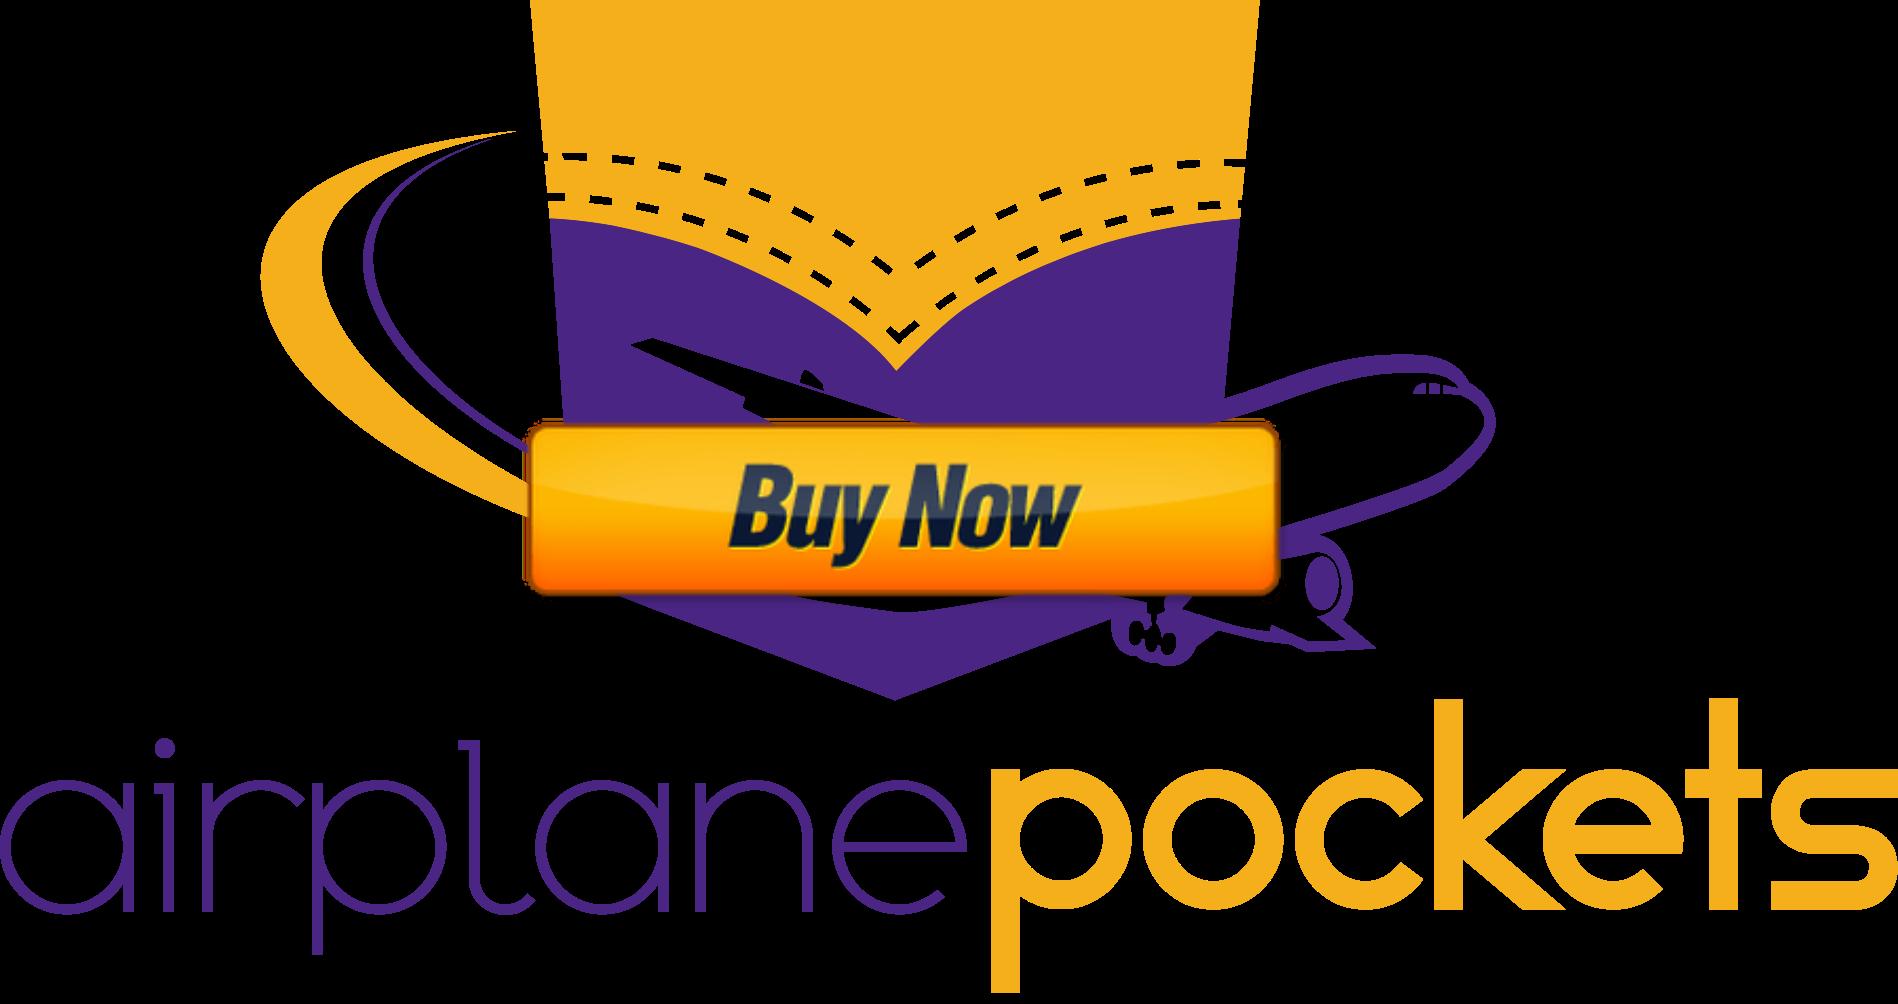 _Airplane Pockets Logo4.png